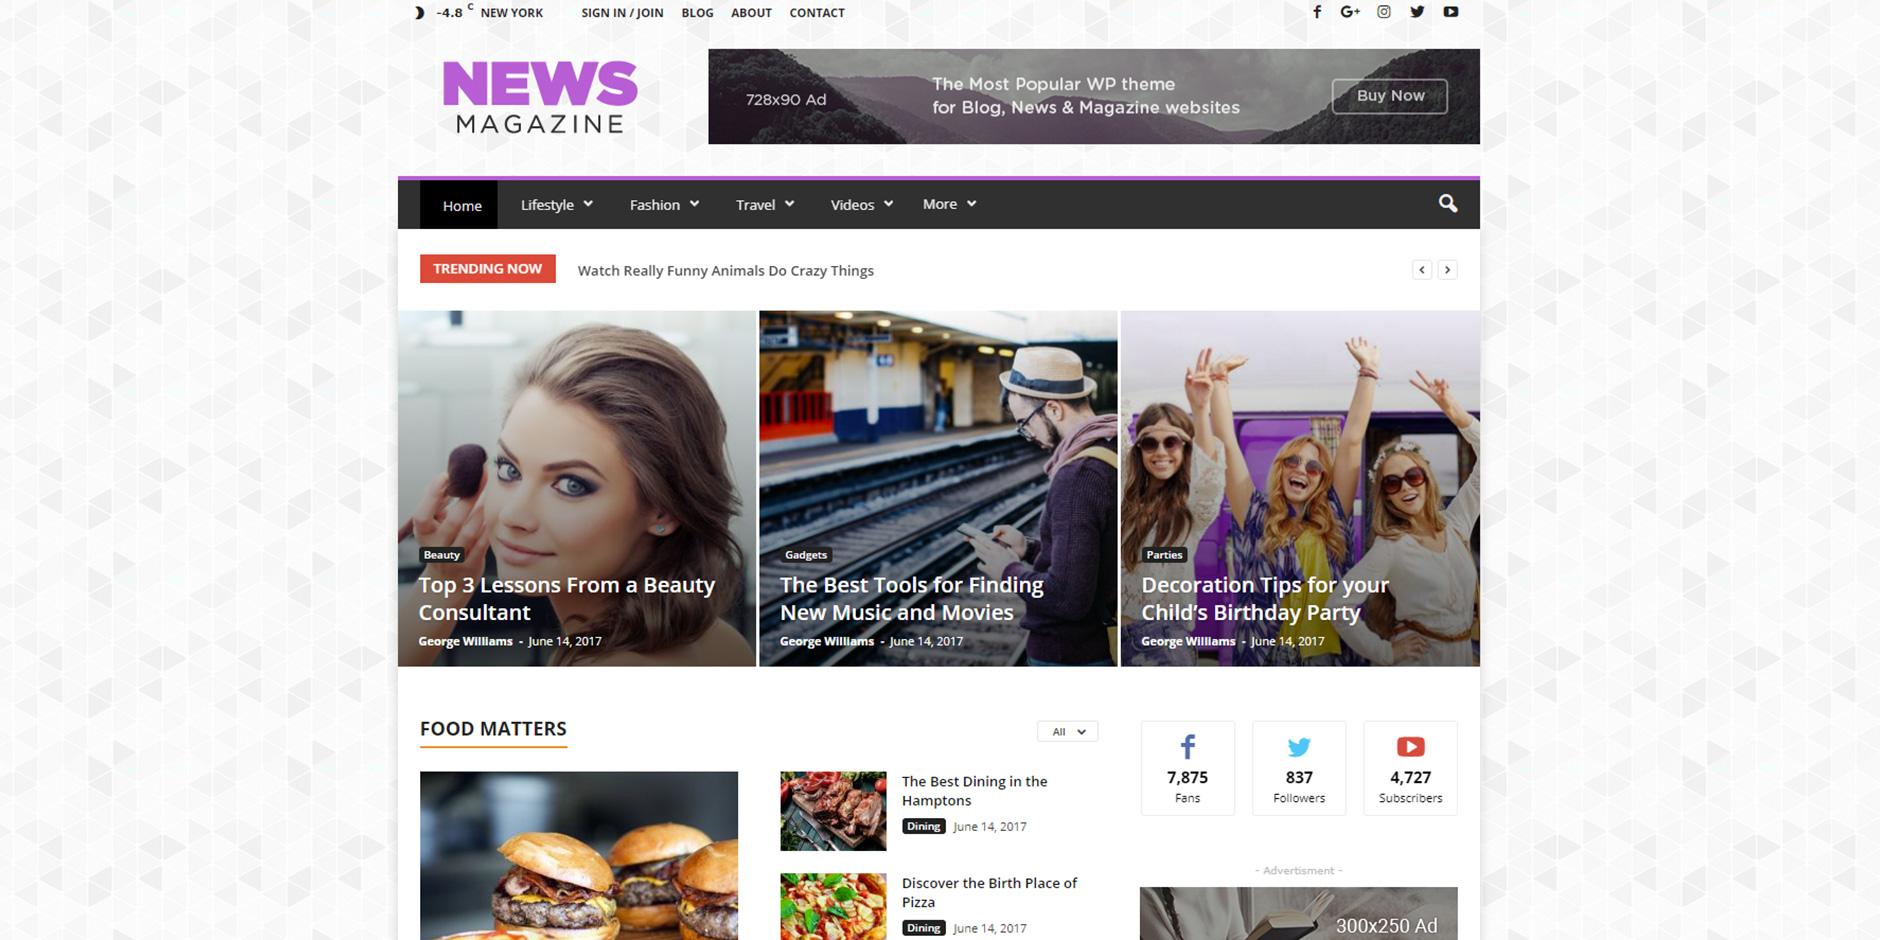 Newsmag_News_Magazine_Demo